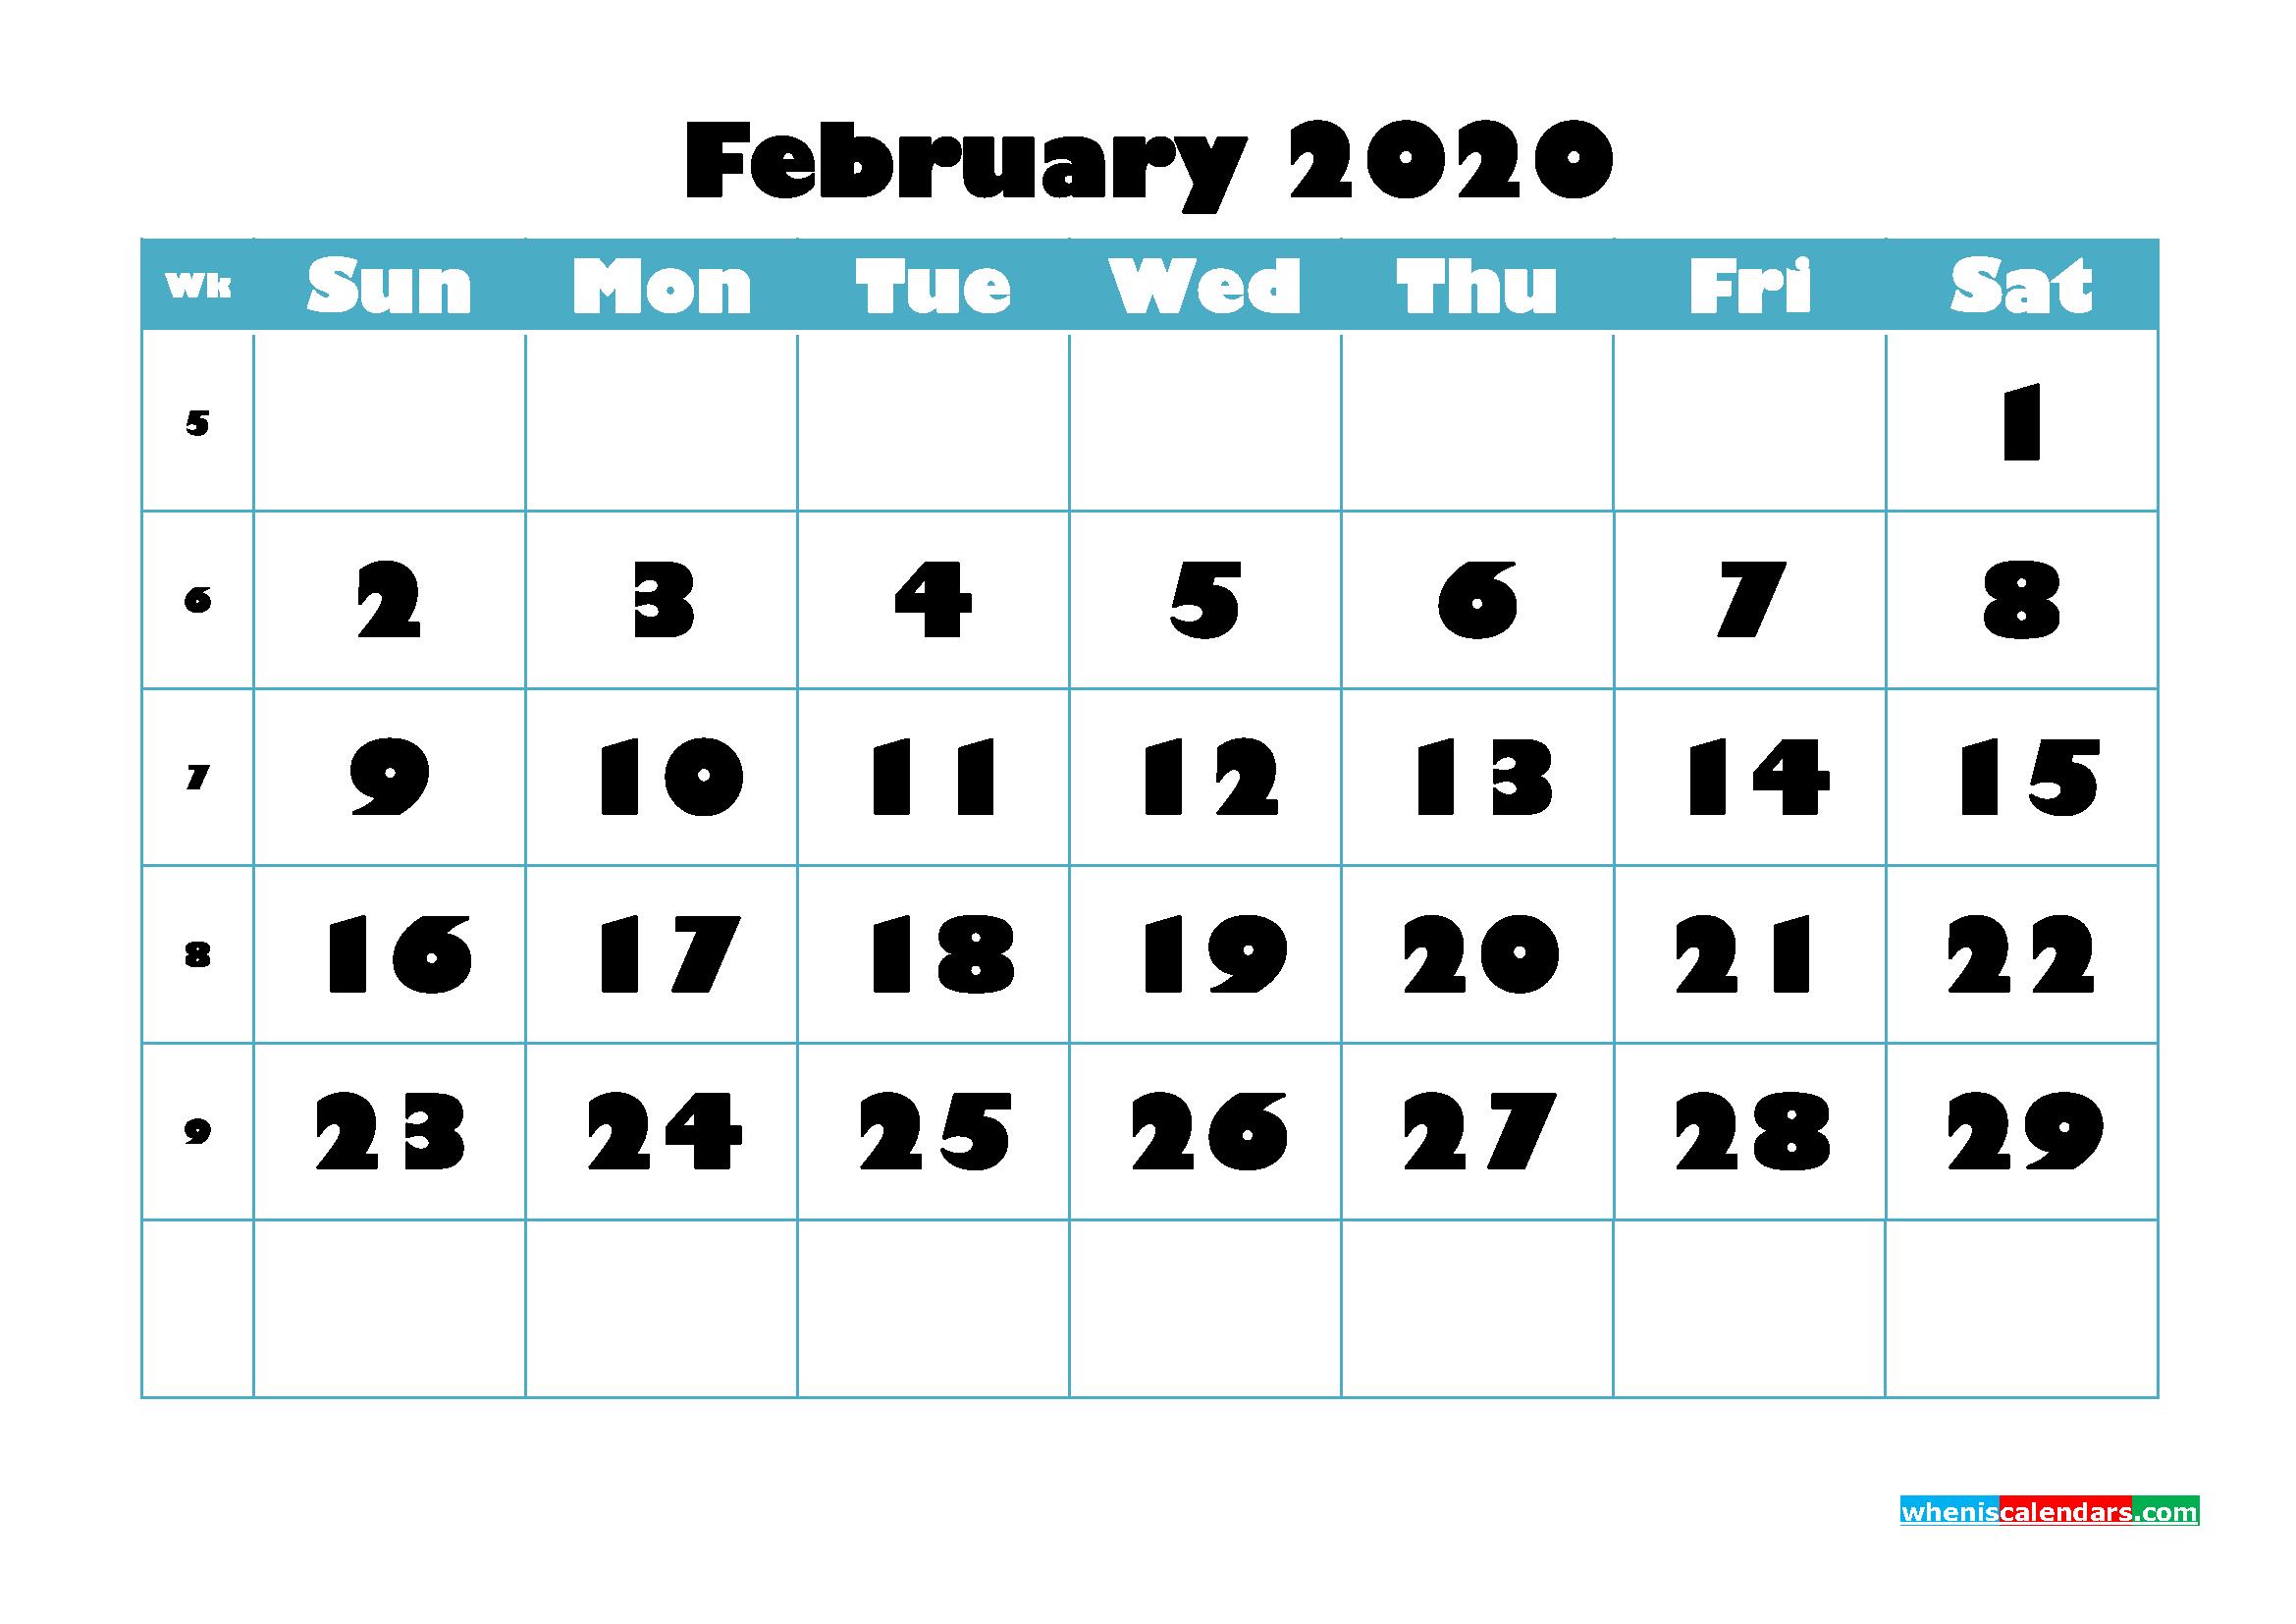 Free Blank Calendar February 2020 Printable - No.m20b758